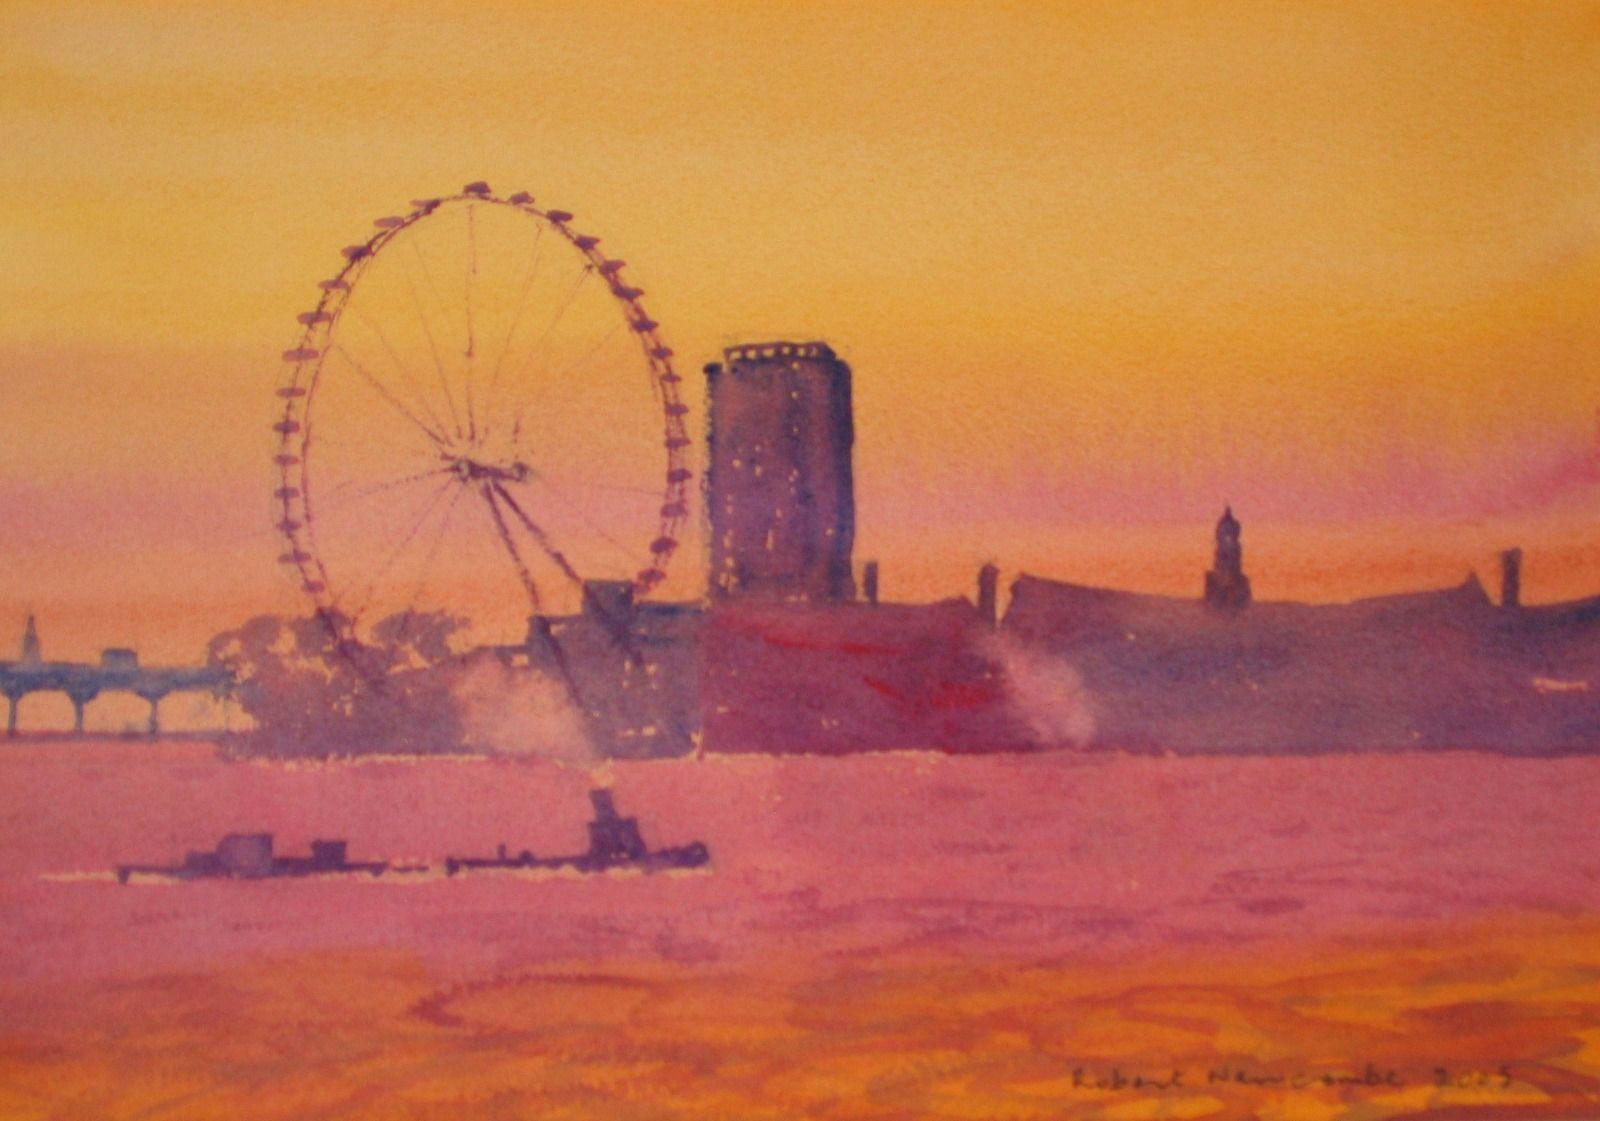 Twillight, London Eye